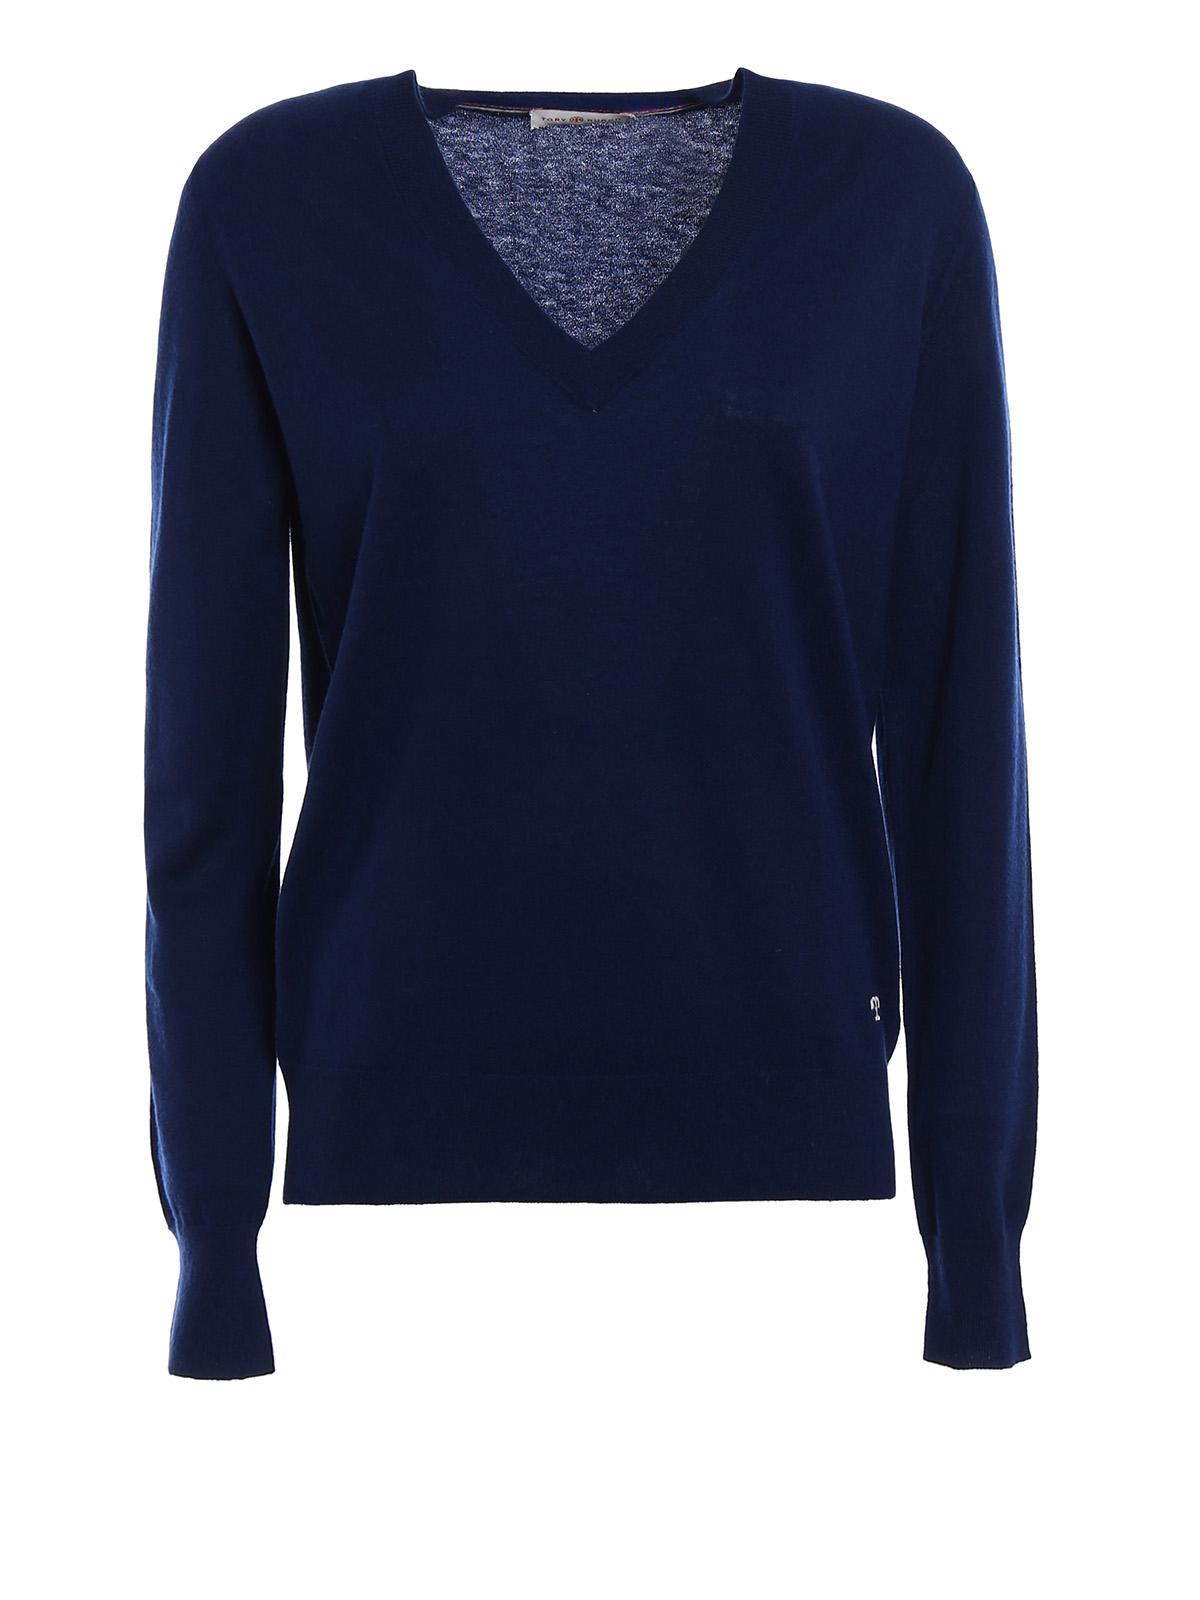 c7ae9fe752a Tory Burch - Marilyn cashmere sweater - v necks - 407240817 403